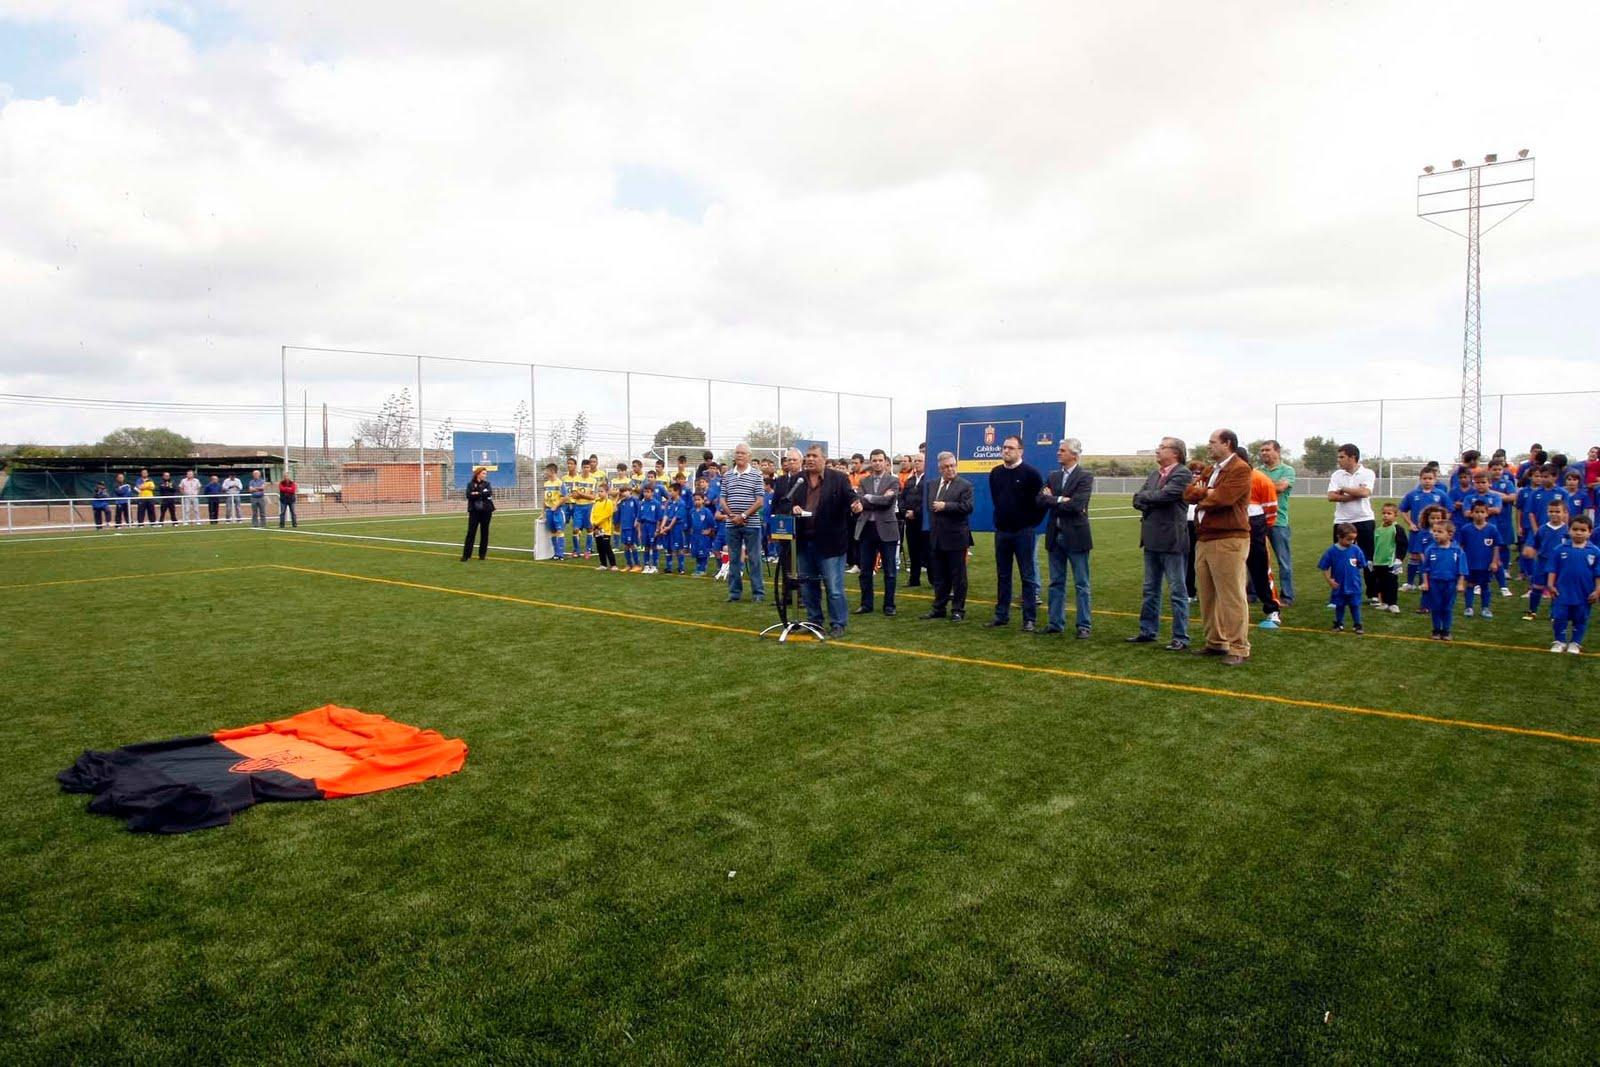 Inauguraci n del c sped artificial del campo de f tbol del - Cesped artificial las palmas ...